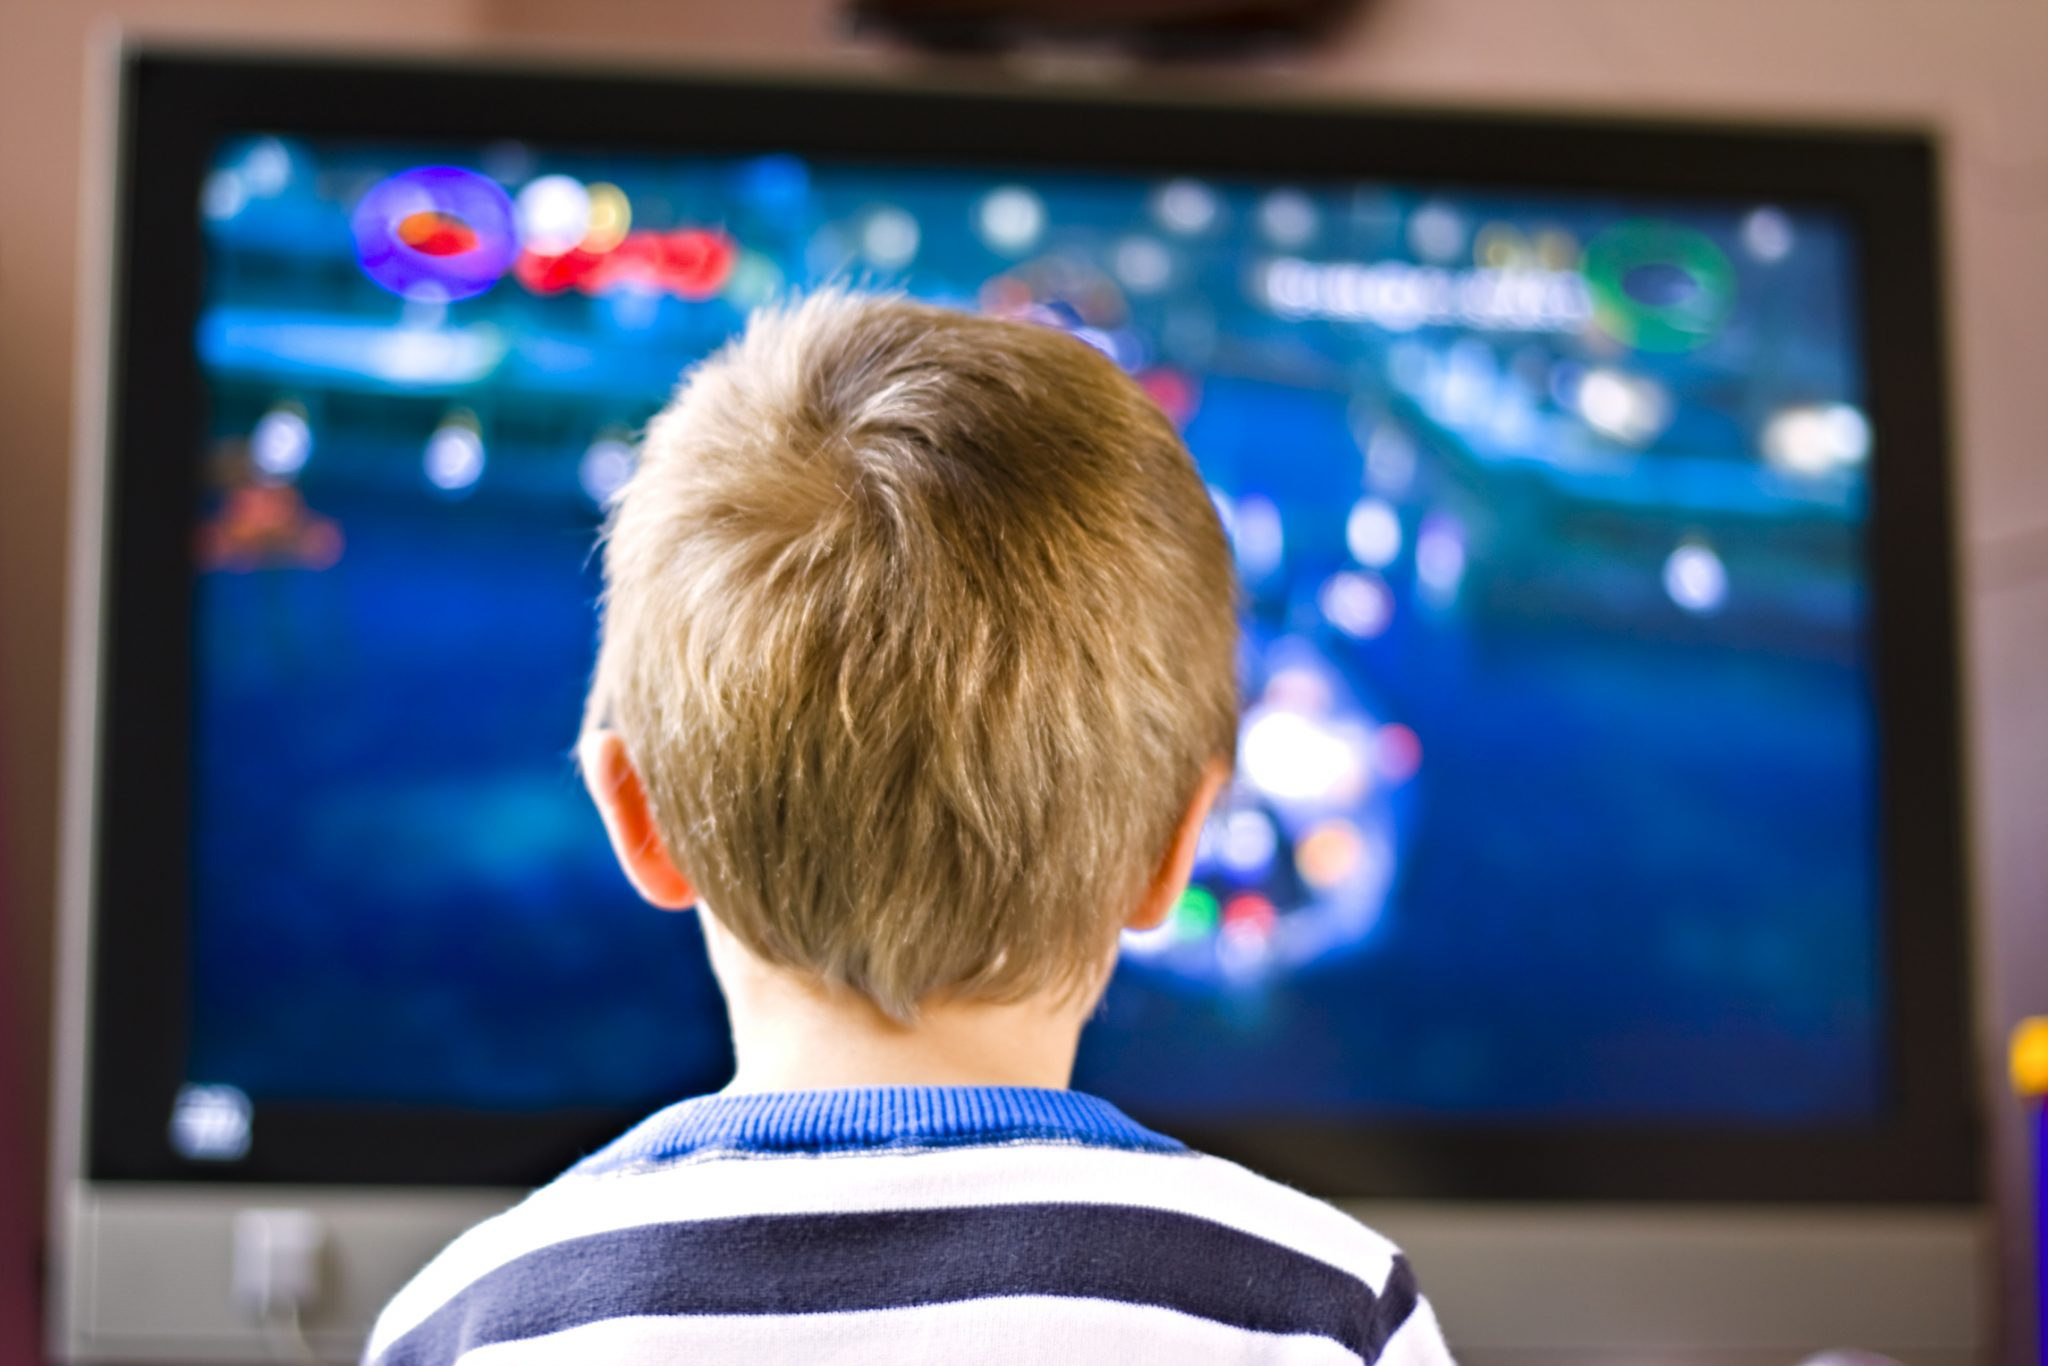 Short essay on influence of tv on children